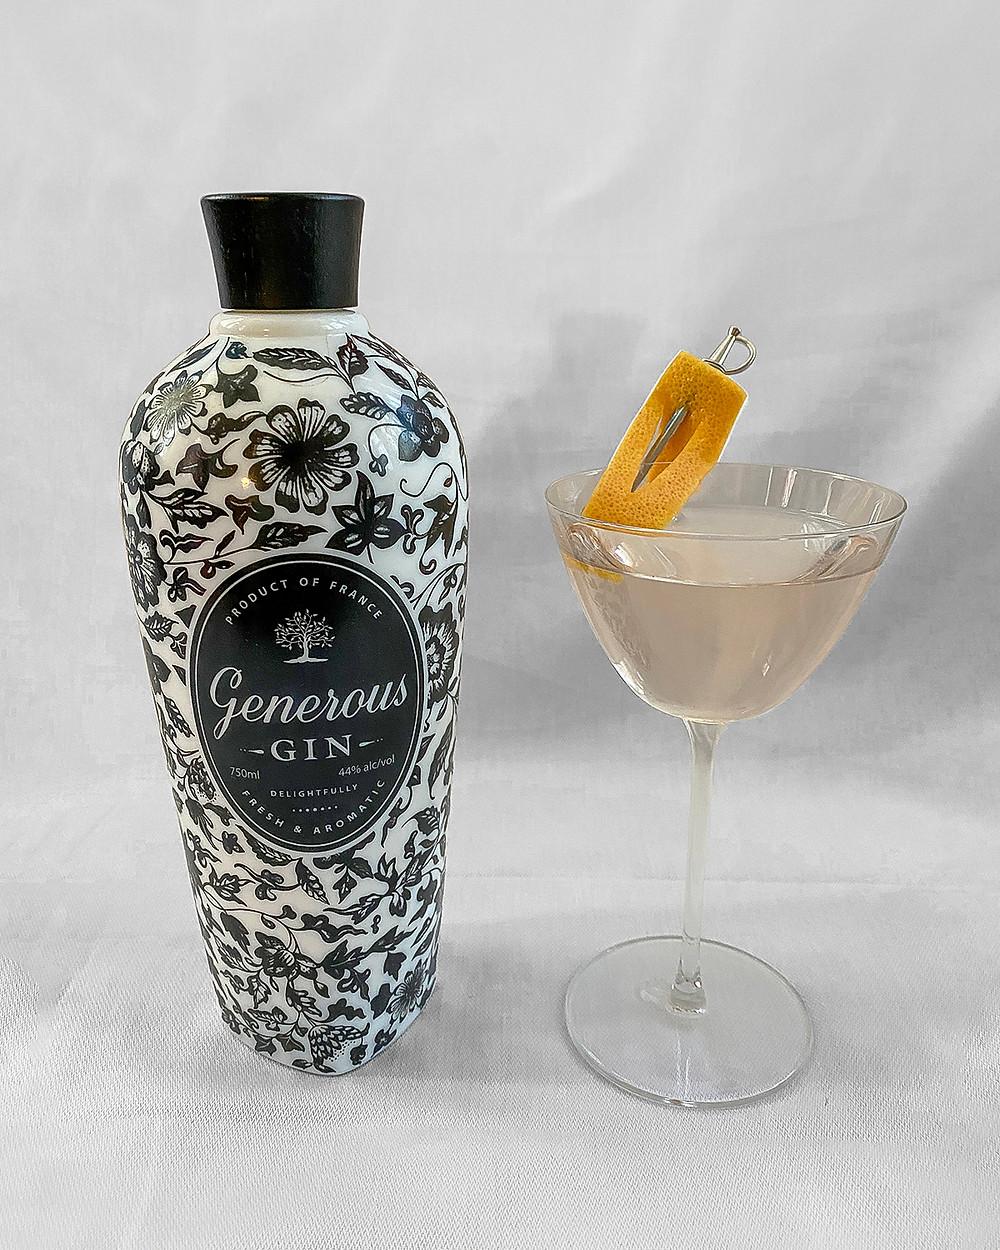 Gin Professors Generous Gin